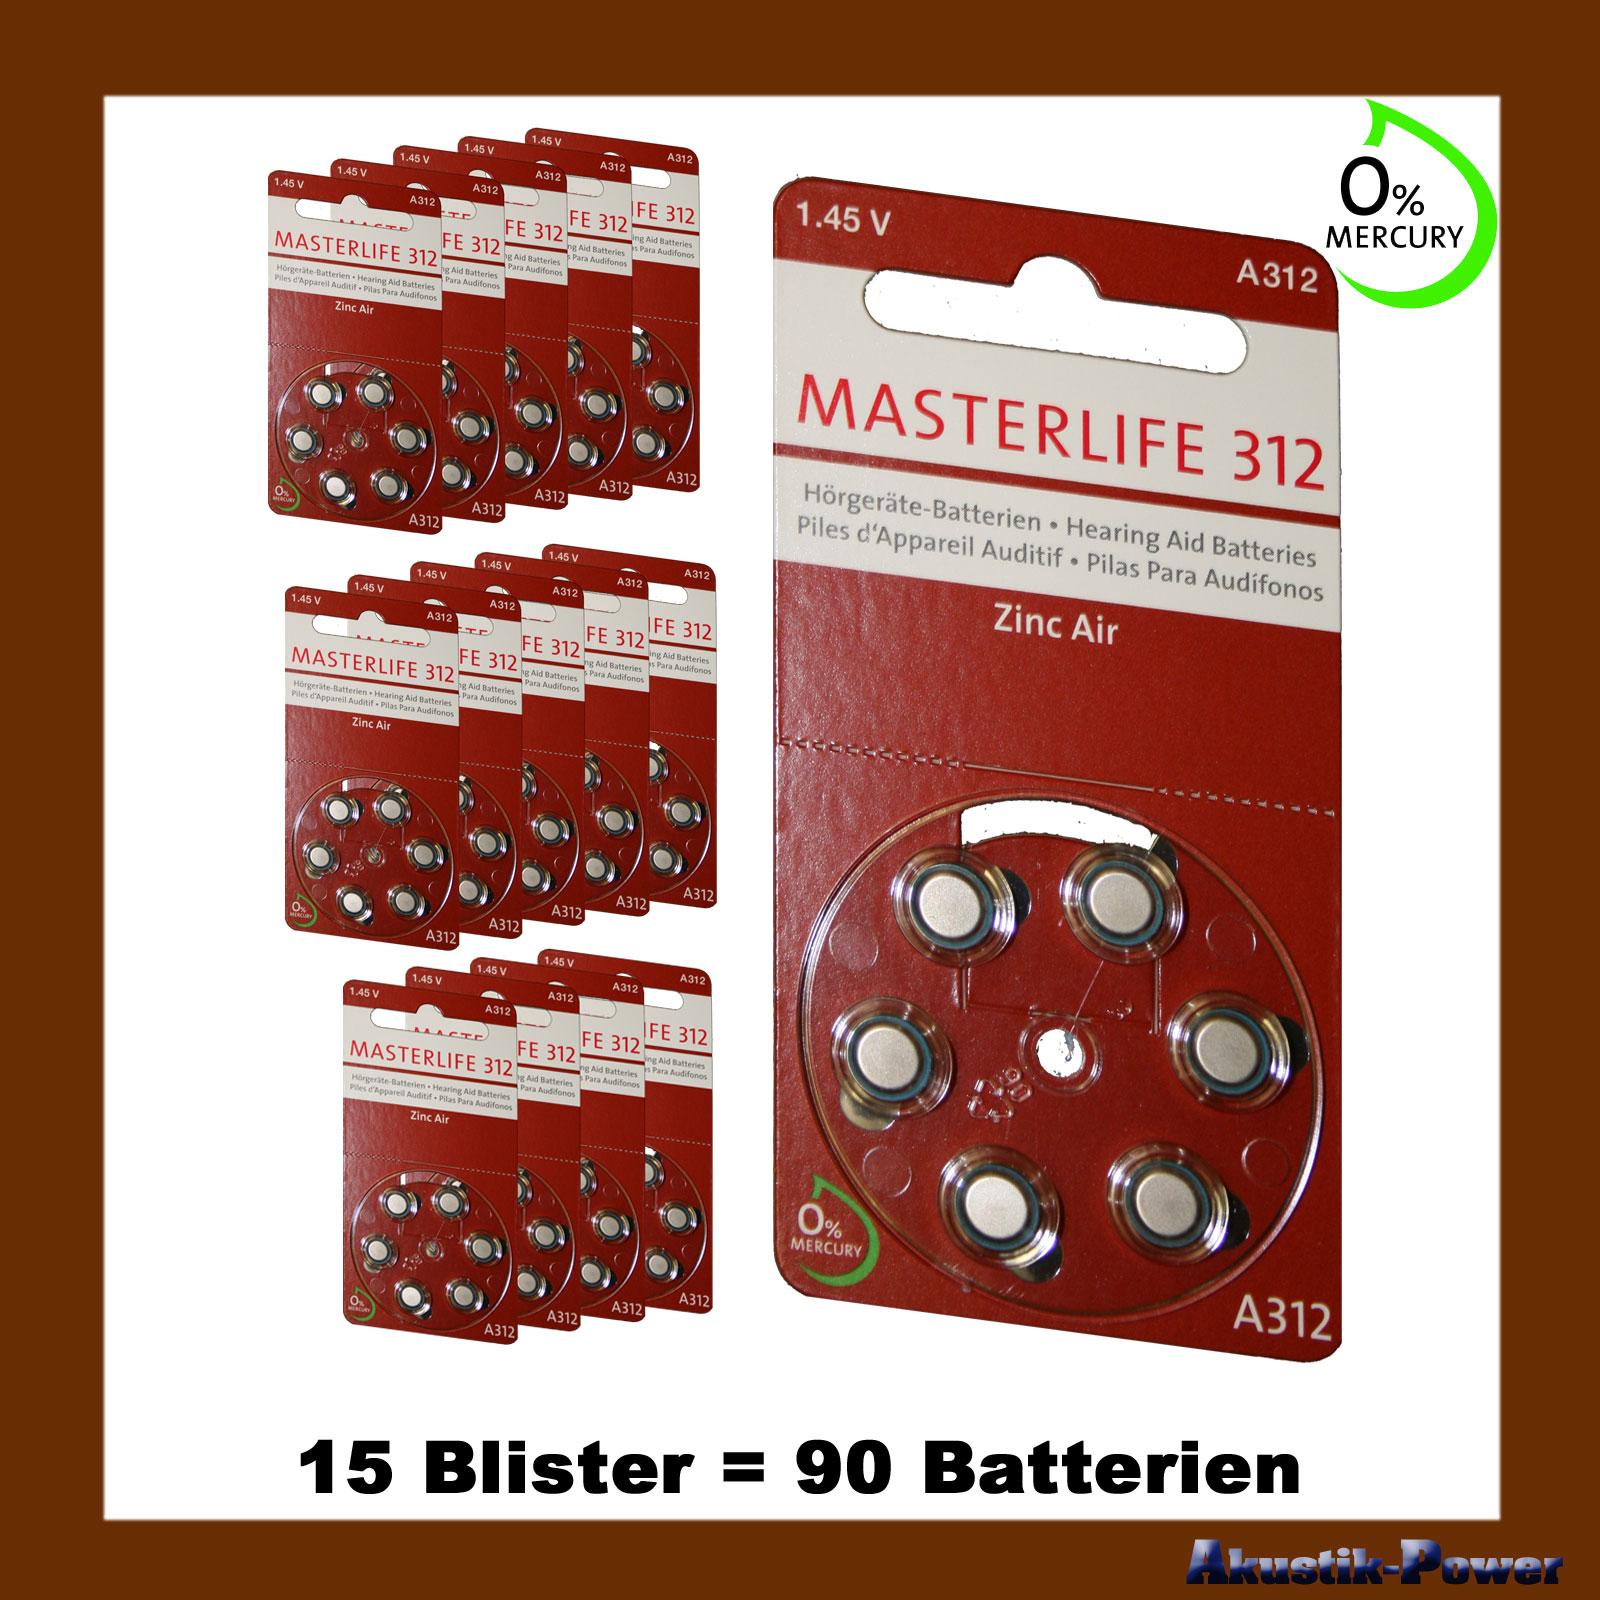 akustik power 90 st ck masterlife h rger te batterie typ 312 pr41 braun a312 mercury free. Black Bedroom Furniture Sets. Home Design Ideas